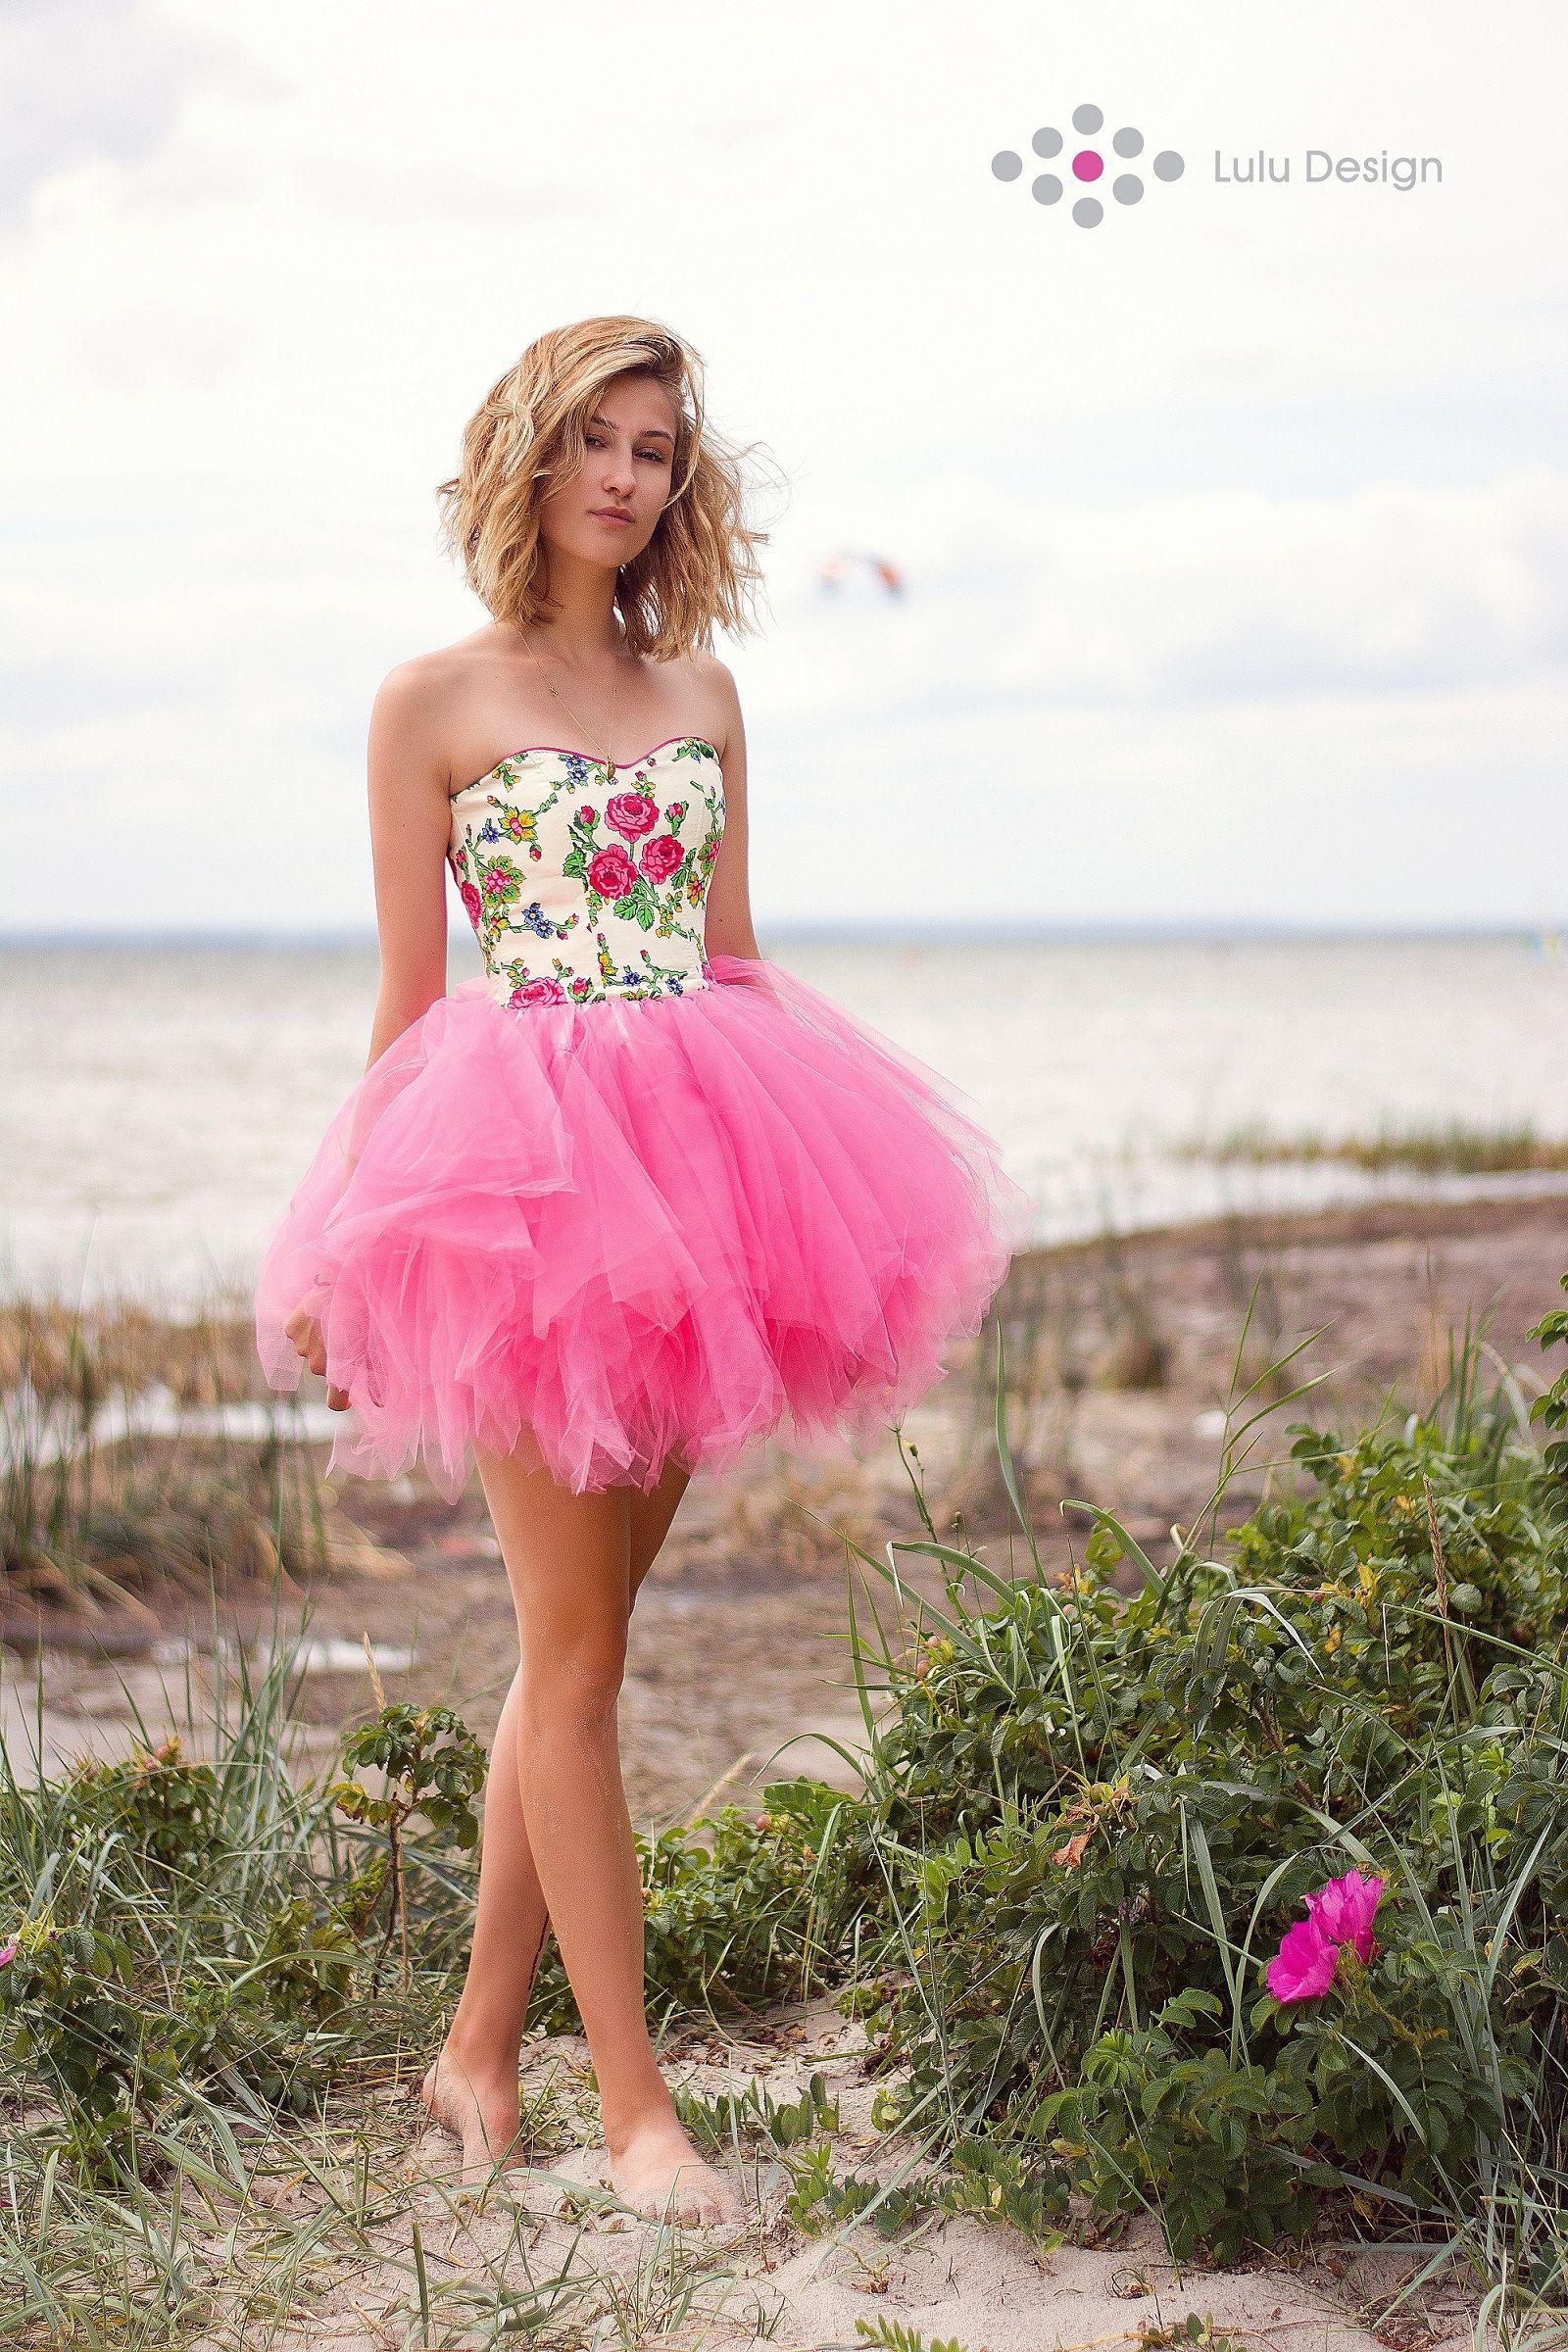 Suknia Z Tiulem I Gorsetem W Kwiaty Dress Luludesign Unique Hel Morzebaltyckie Minidress Pink Tiul Corset Tulle Madeinpoland G Girl Dresses Fashion